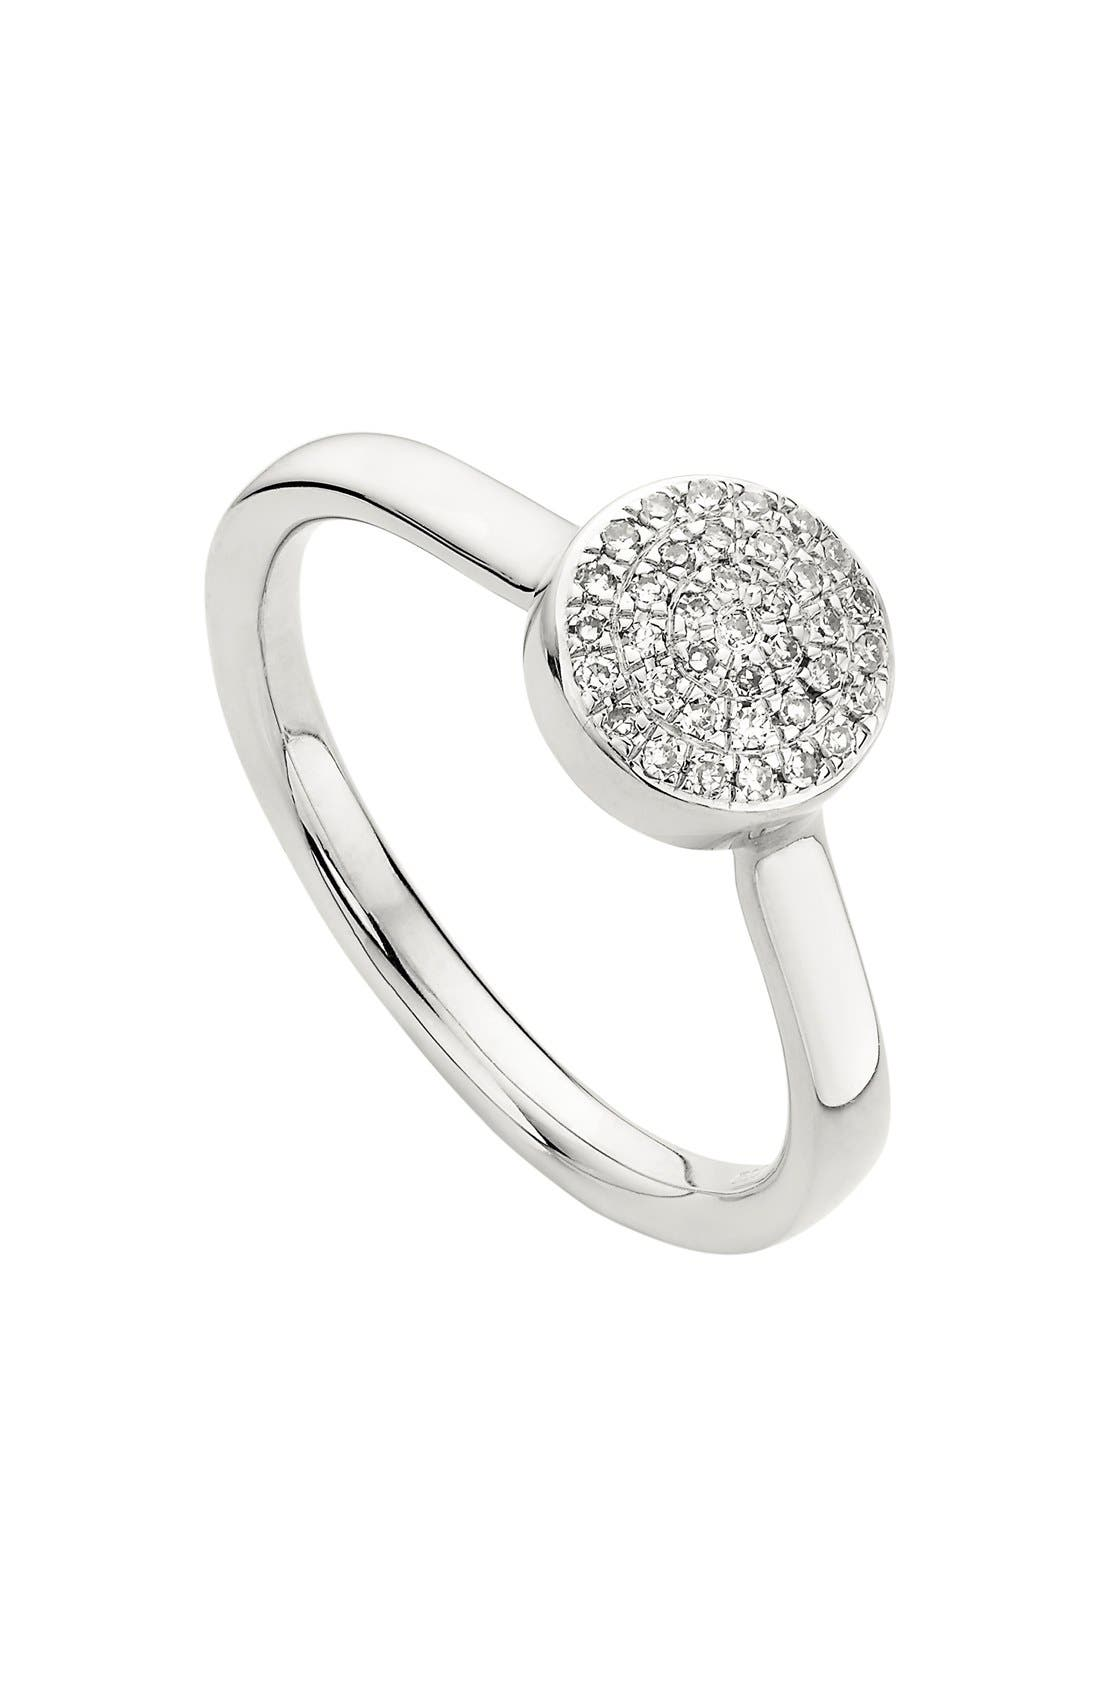 MONICA VINADER, Ava Diamond Button Ring, Main thumbnail 1, color, SILVER